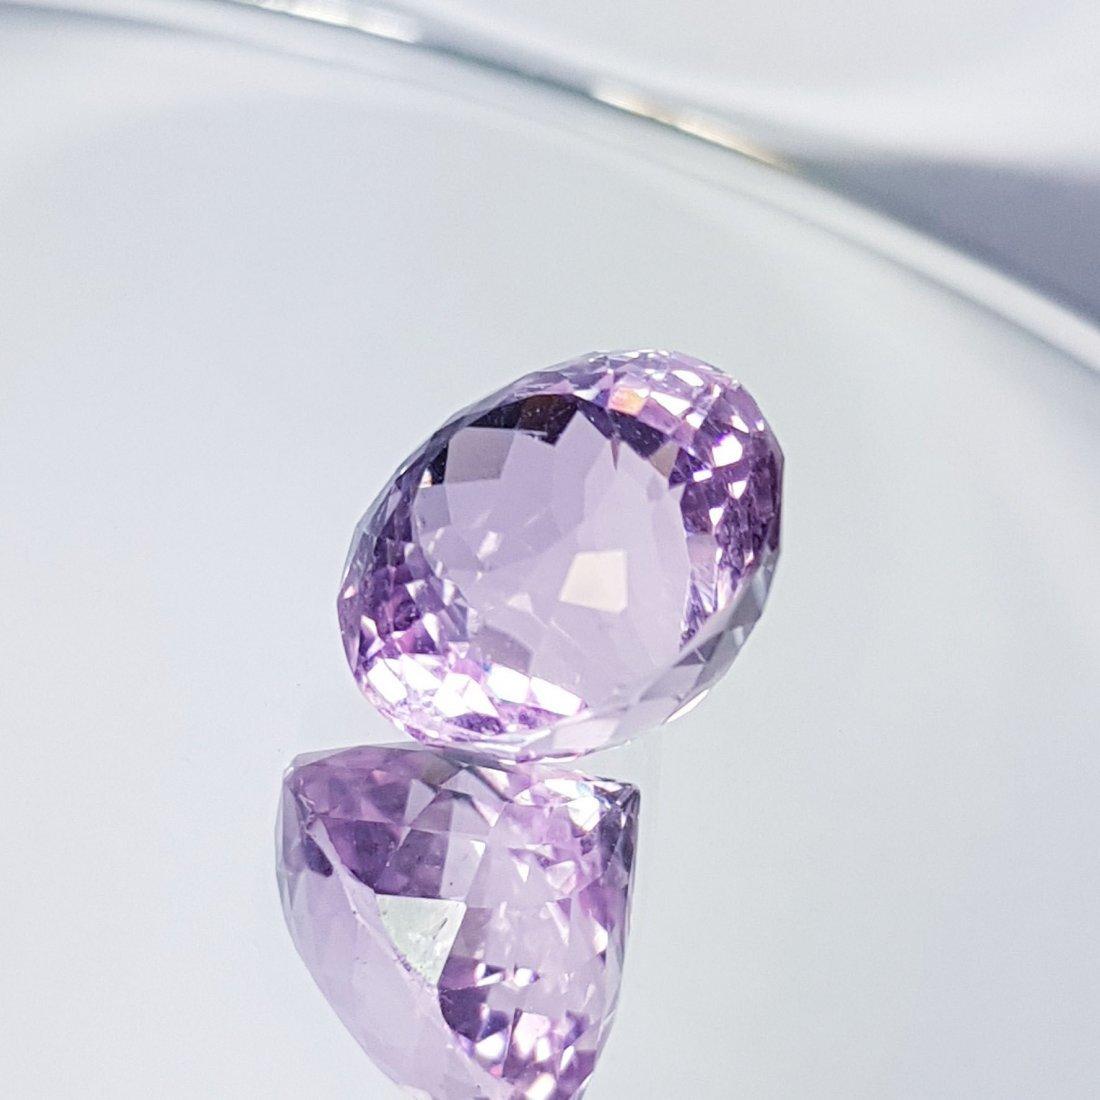 Pink Kunzite - 13.39 ct - 3